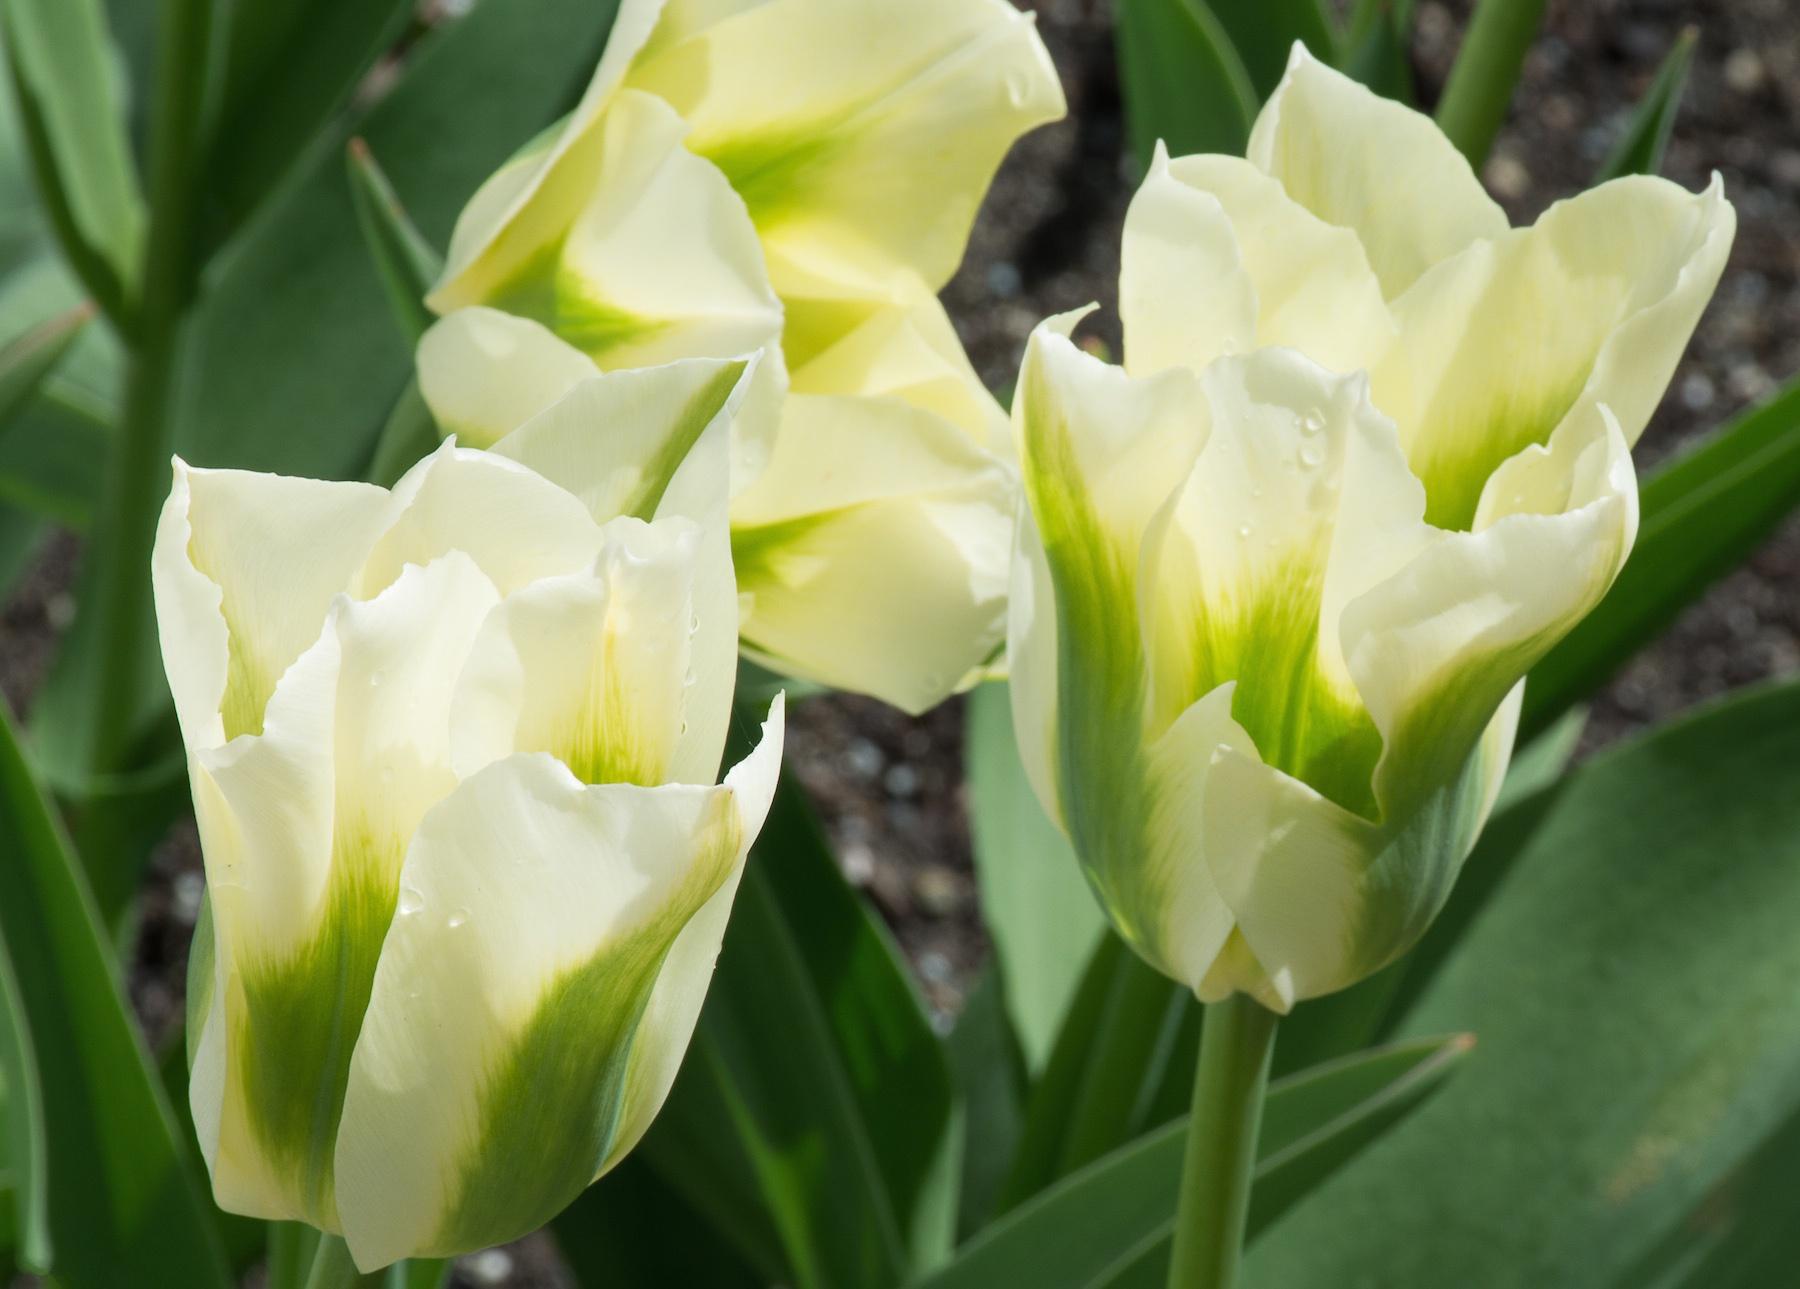 схема размещения на клумбе из еюльпанов и нарцисов